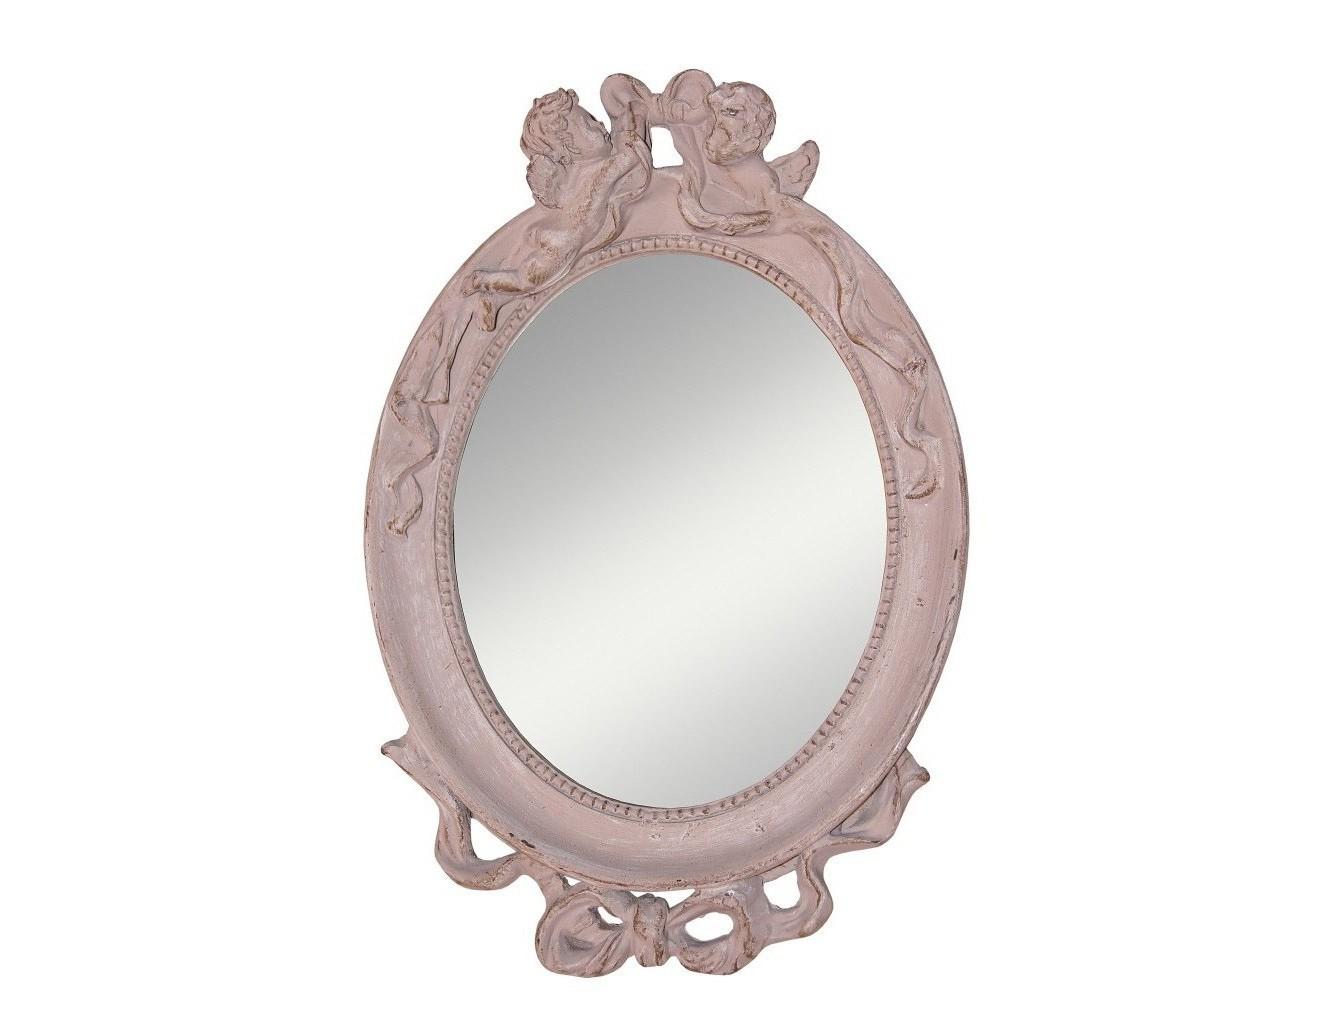 Зеркало AuroraНастенные зеркала<br>Вес: 2  кг.<br><br>Material: МДФ<br>Ширина см: 20<br>Высота см: 25<br>Глубина см: 3